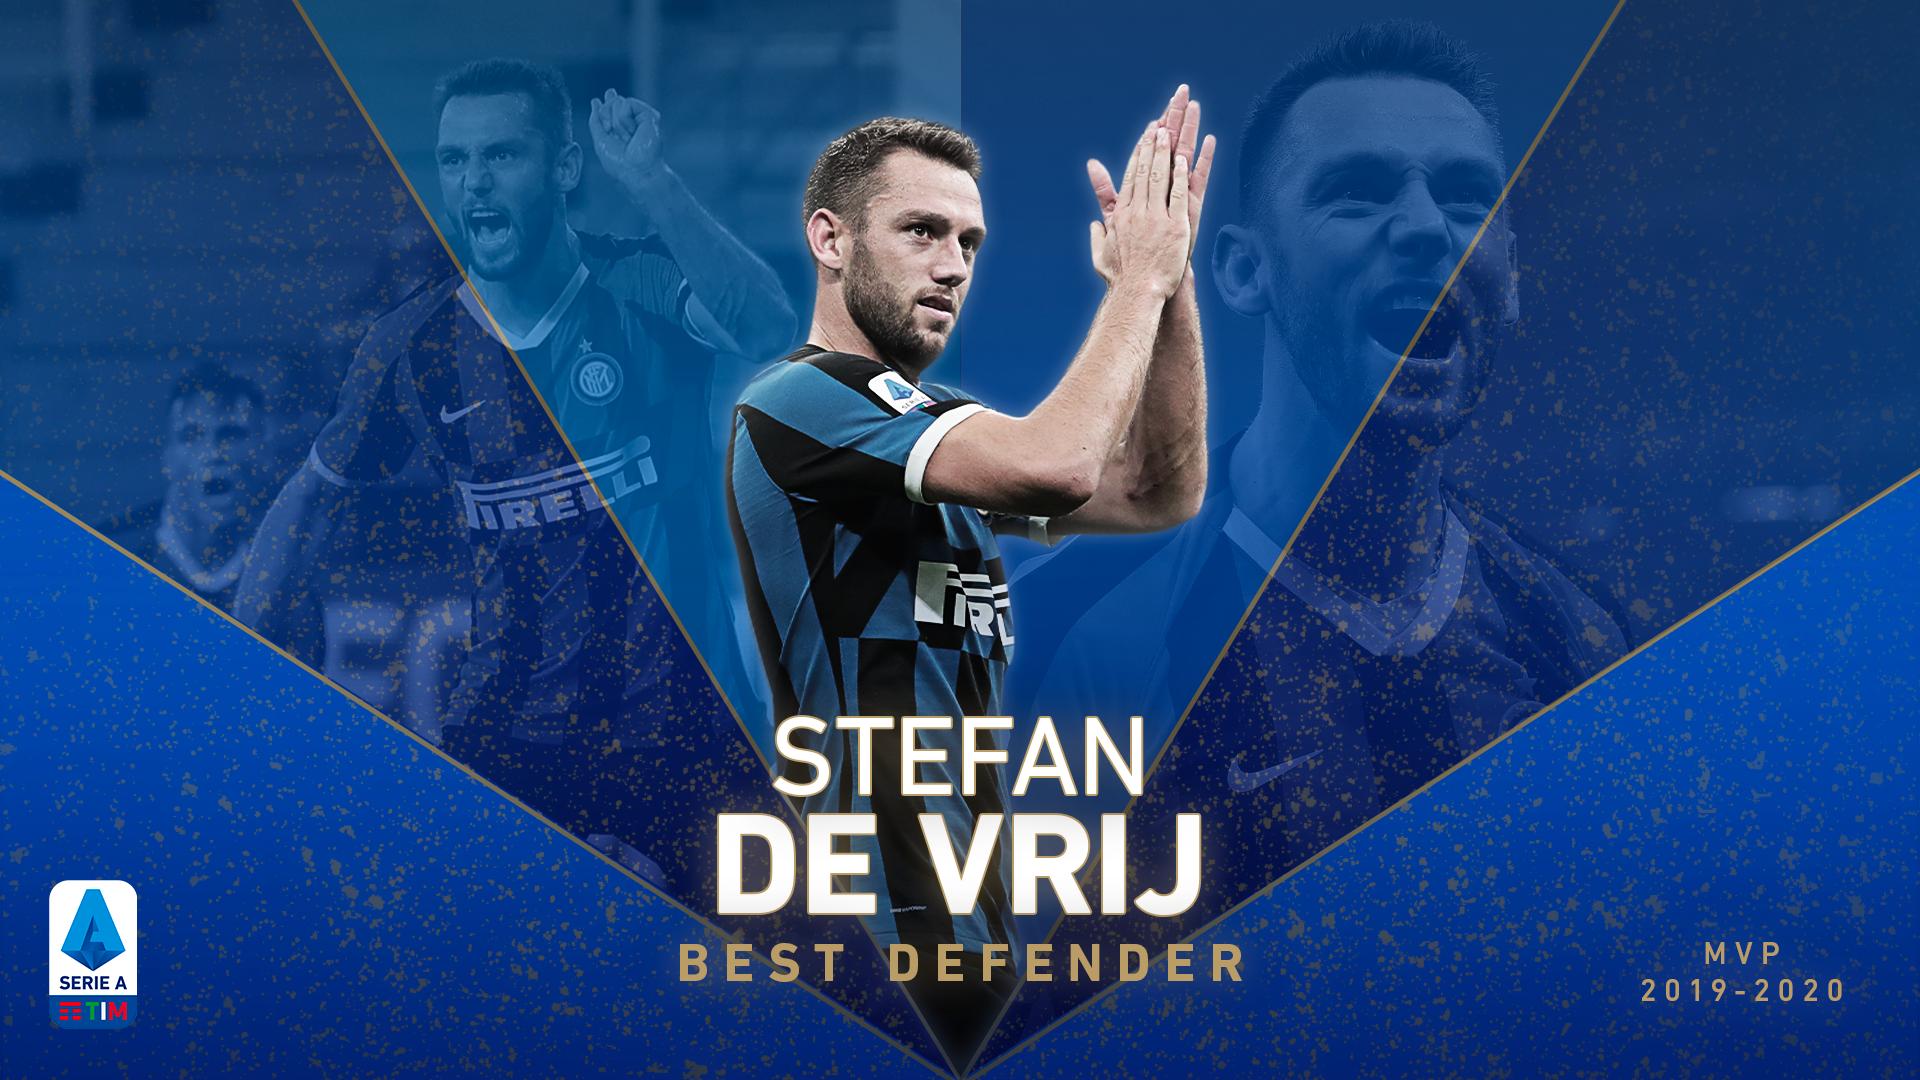 STEFAN DE VRIJ - BEST DEFENDER OF THE SERIE A TIM 2019/2020